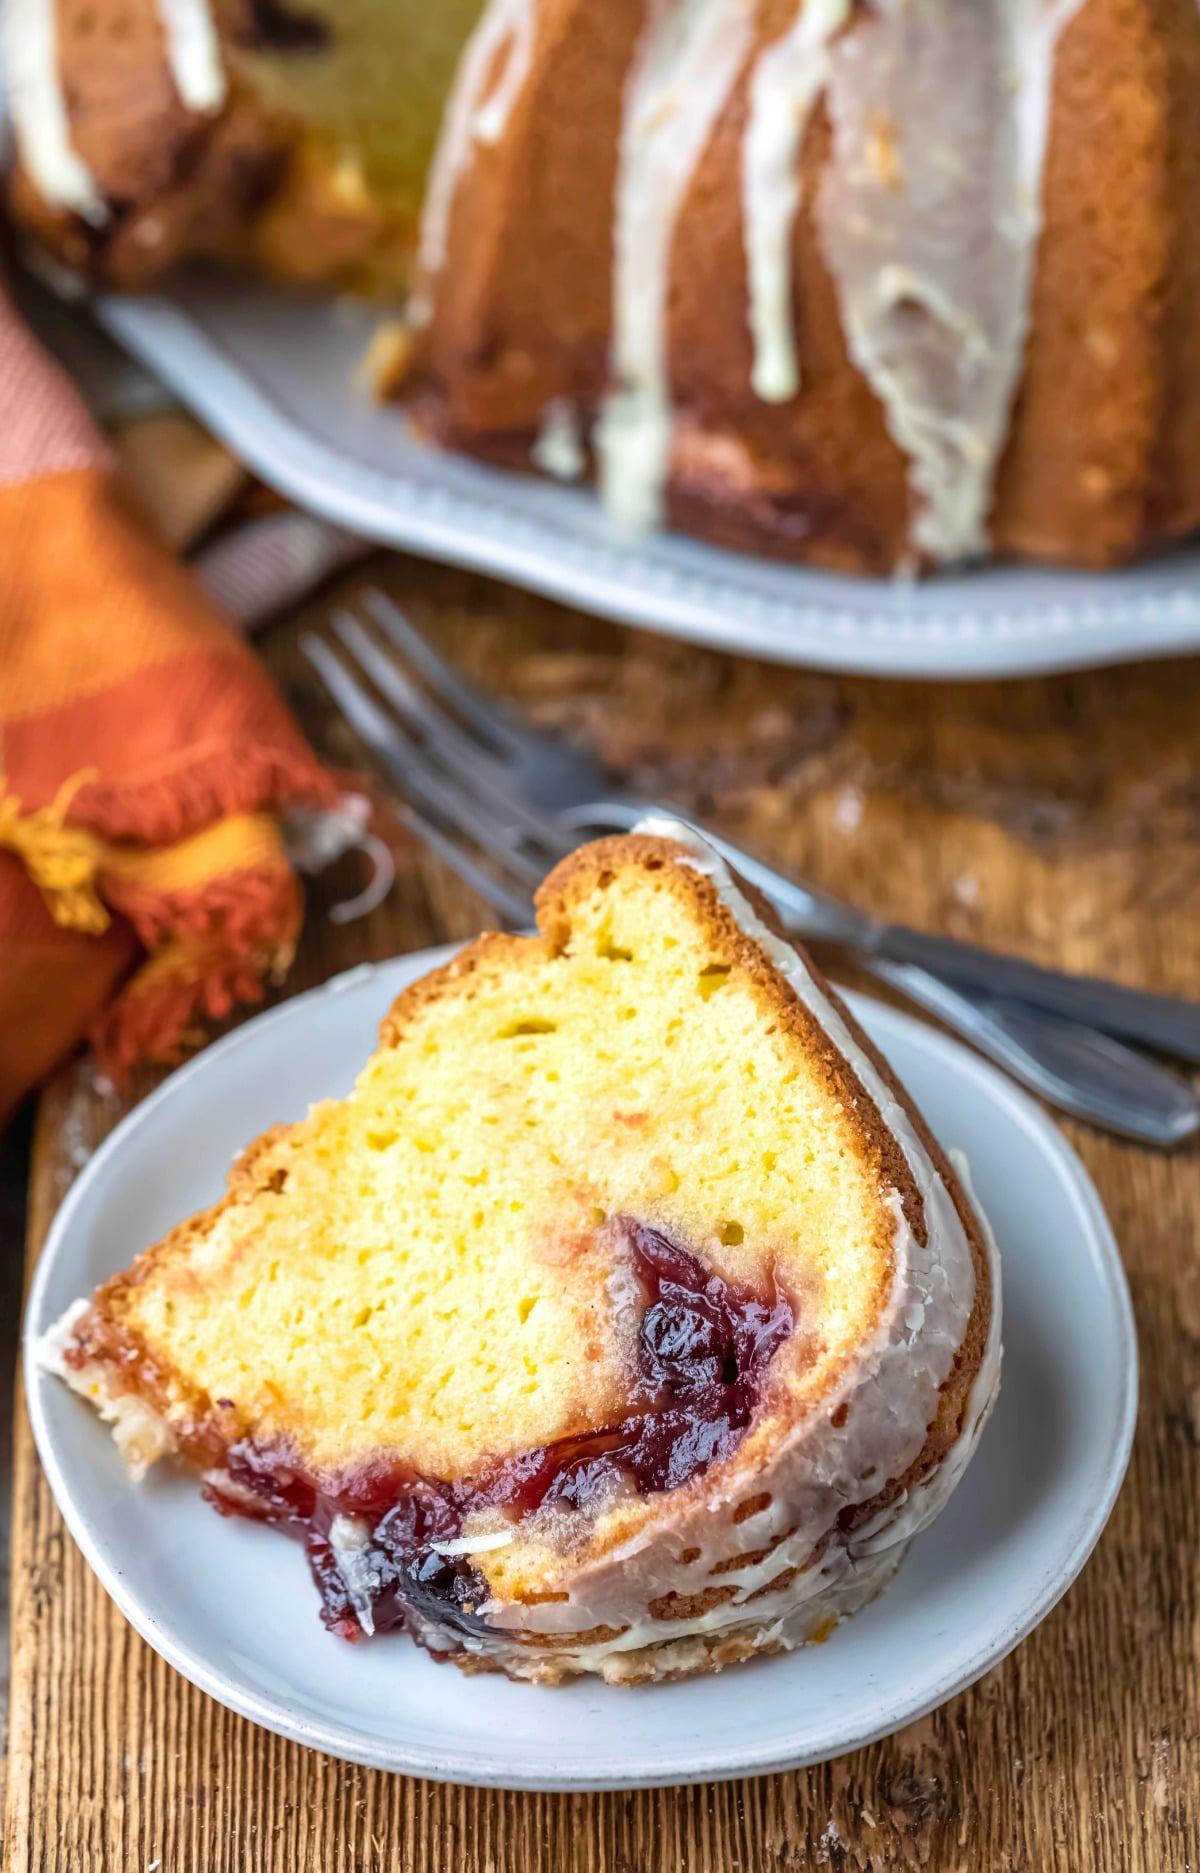 Slice of cranberry orange pound cake on a white plate